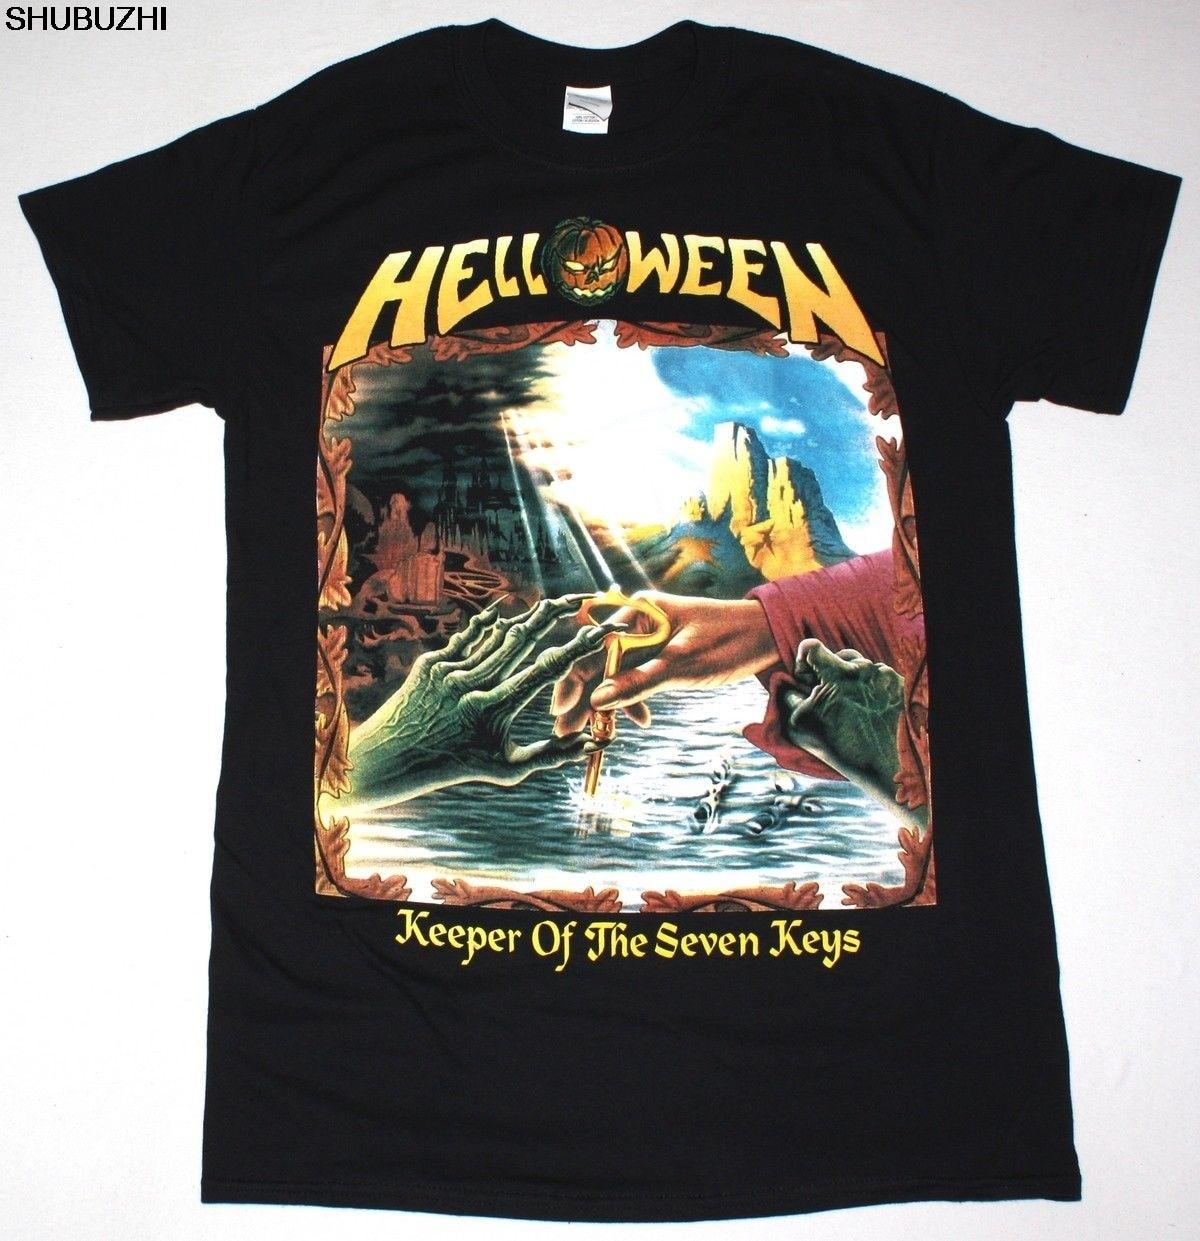 HELLOWEEN KEEPER OF THE SEVEN KEYS, parte II, HEAVY METAL KISKE, nueva camiseta negra sbz4253